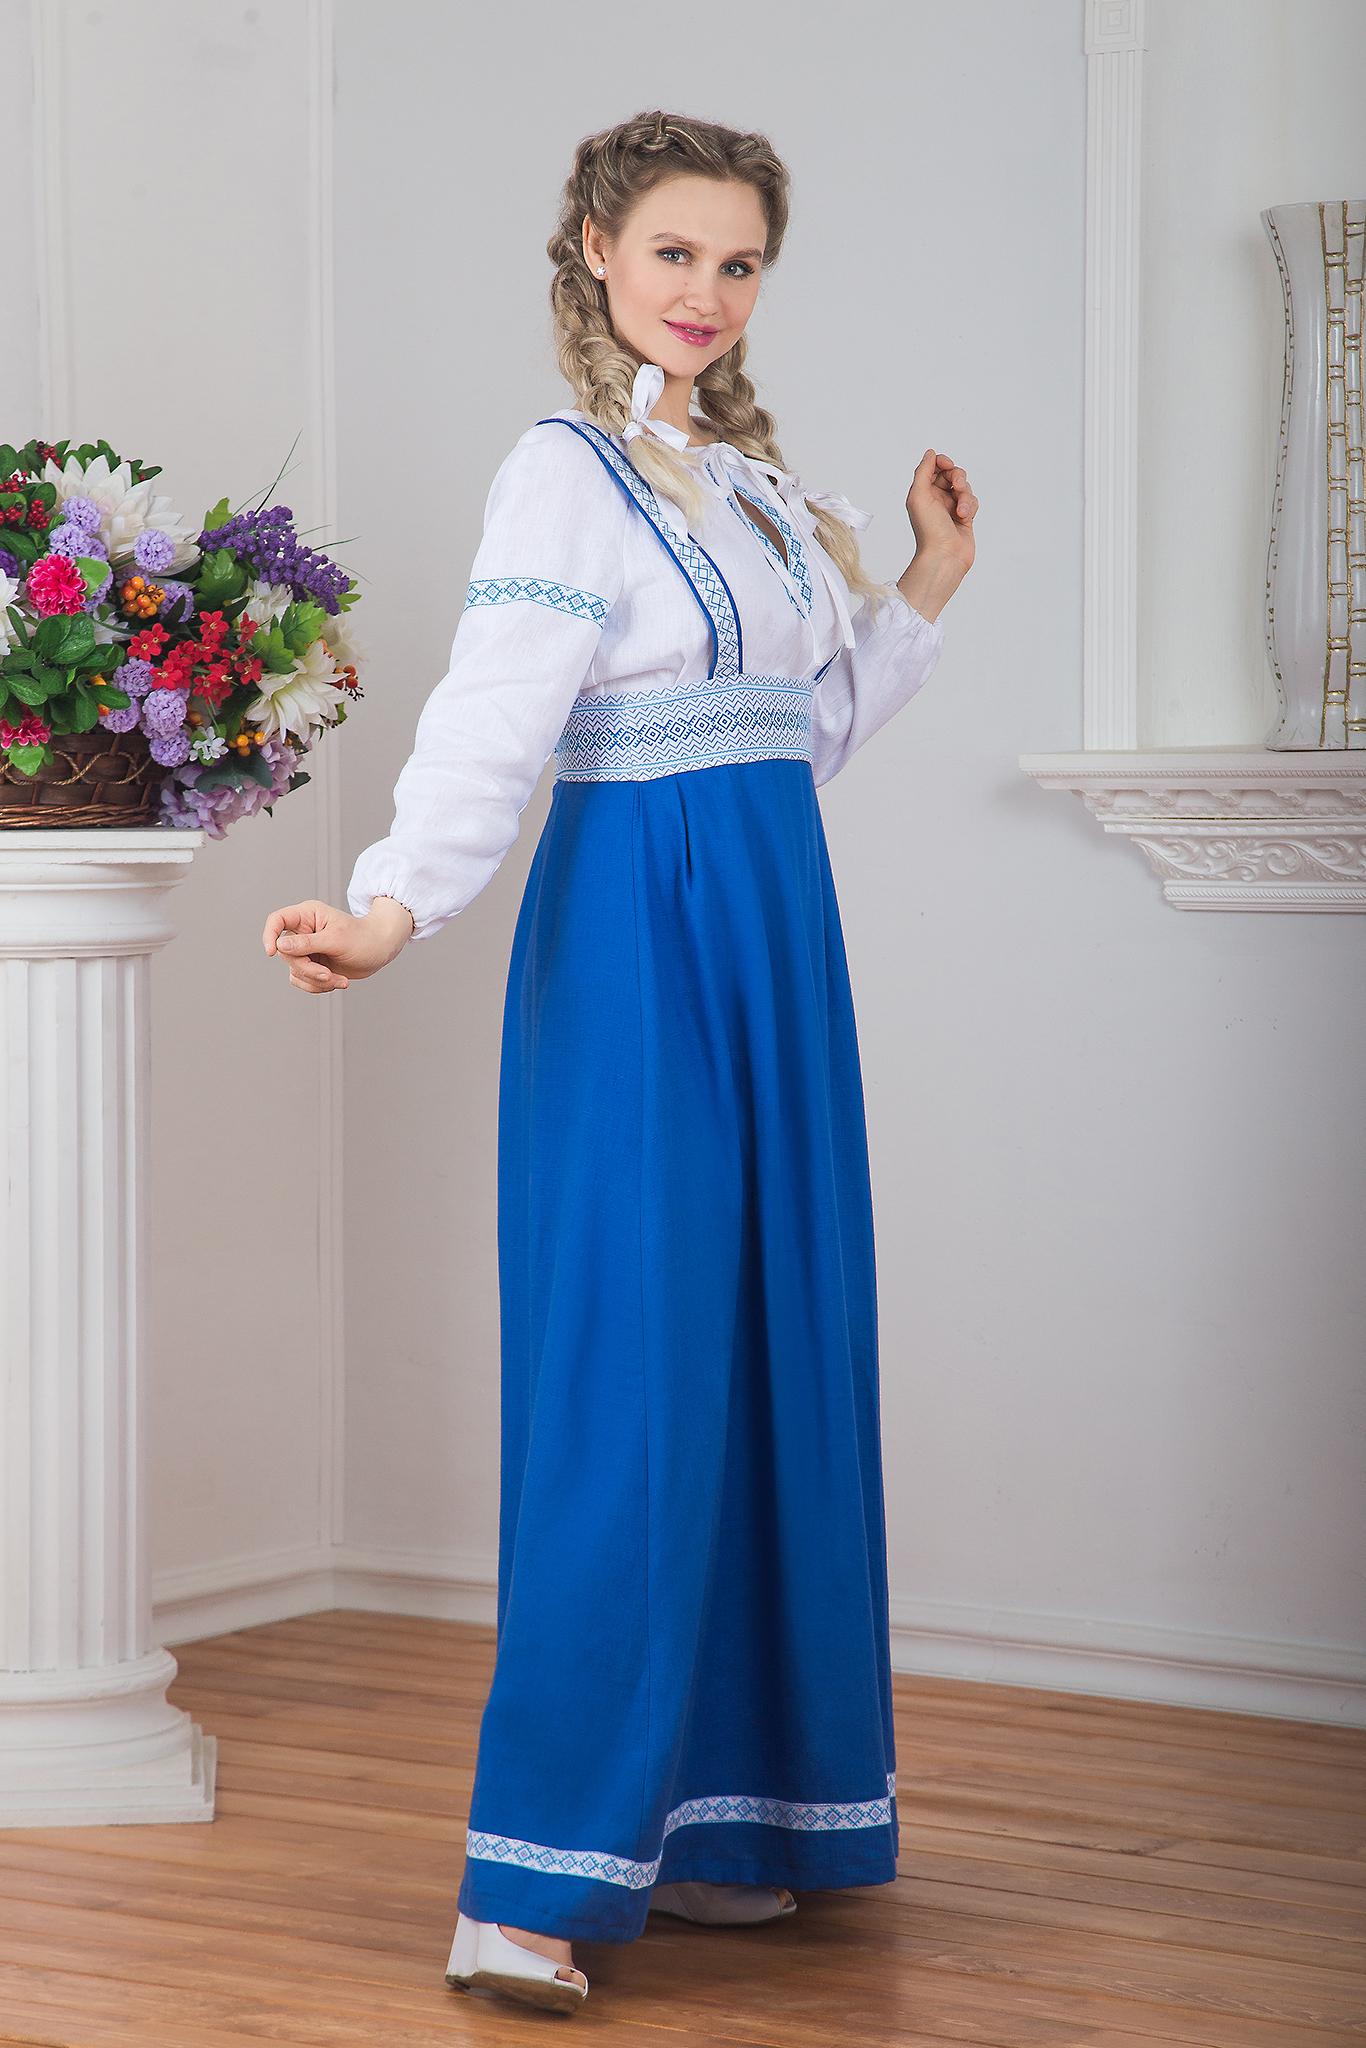 Сарафан подгрудный Орепей синий вид сбоку